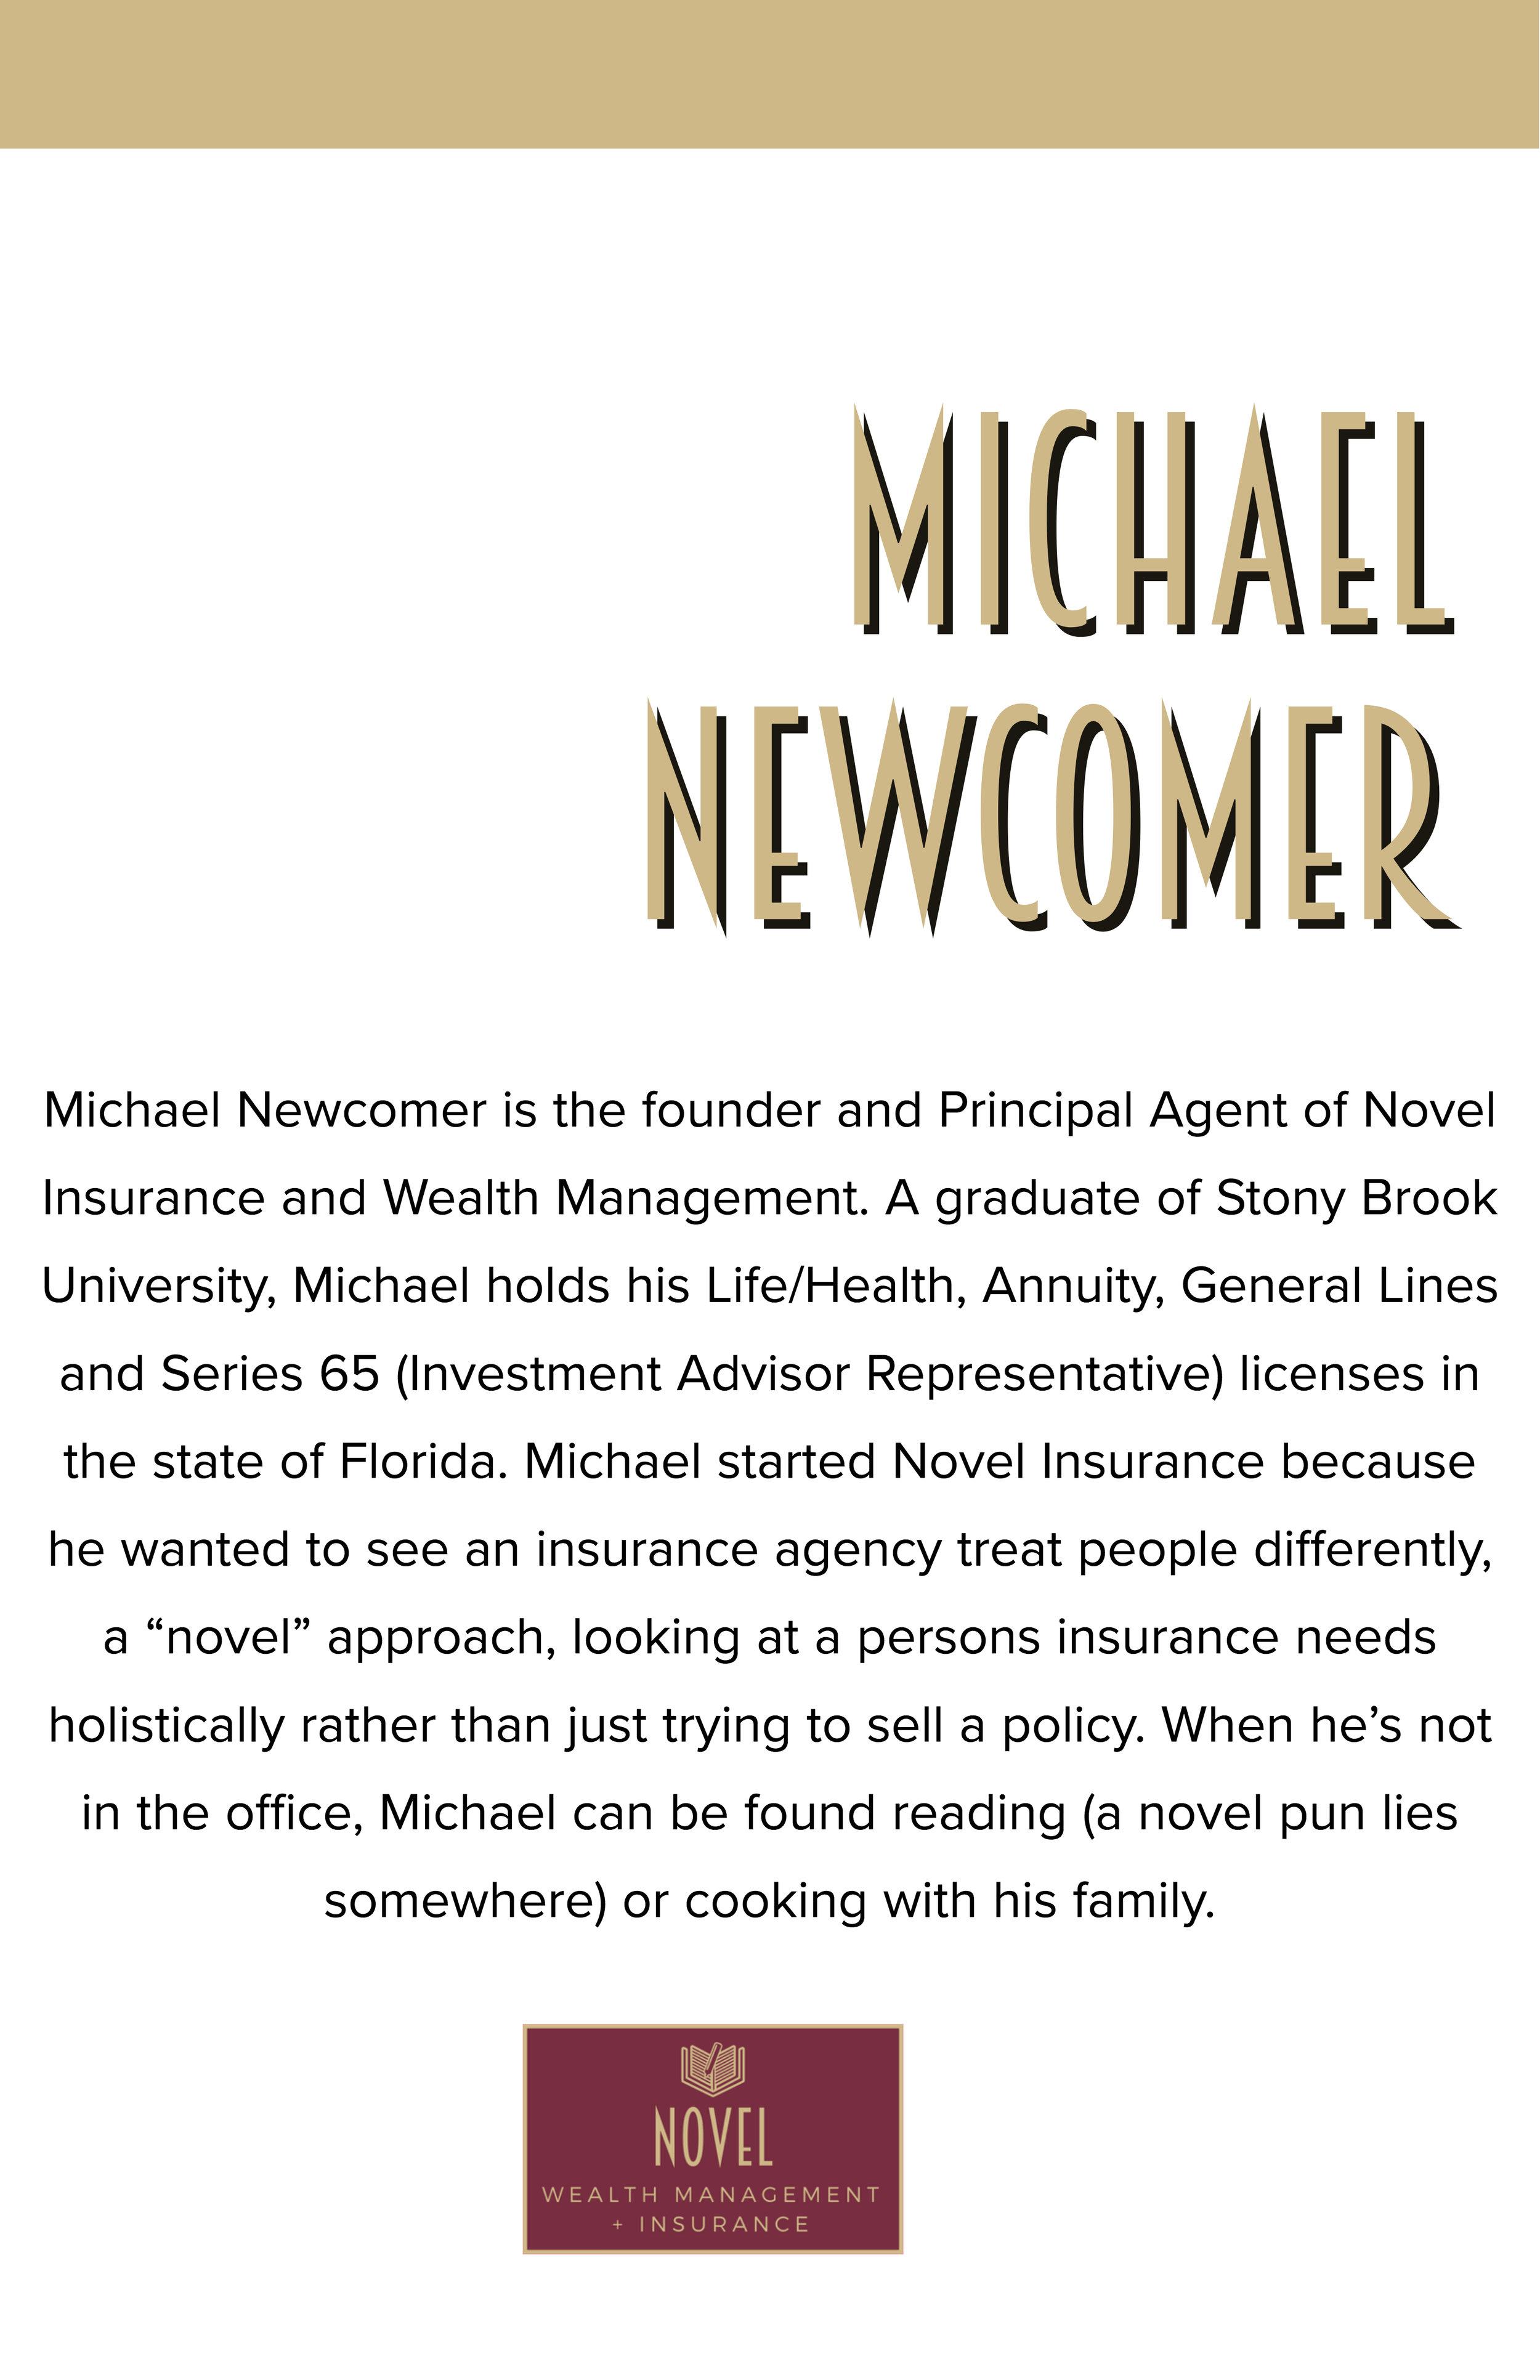 Novel Insurance Michael Newcomer About Me.jpg